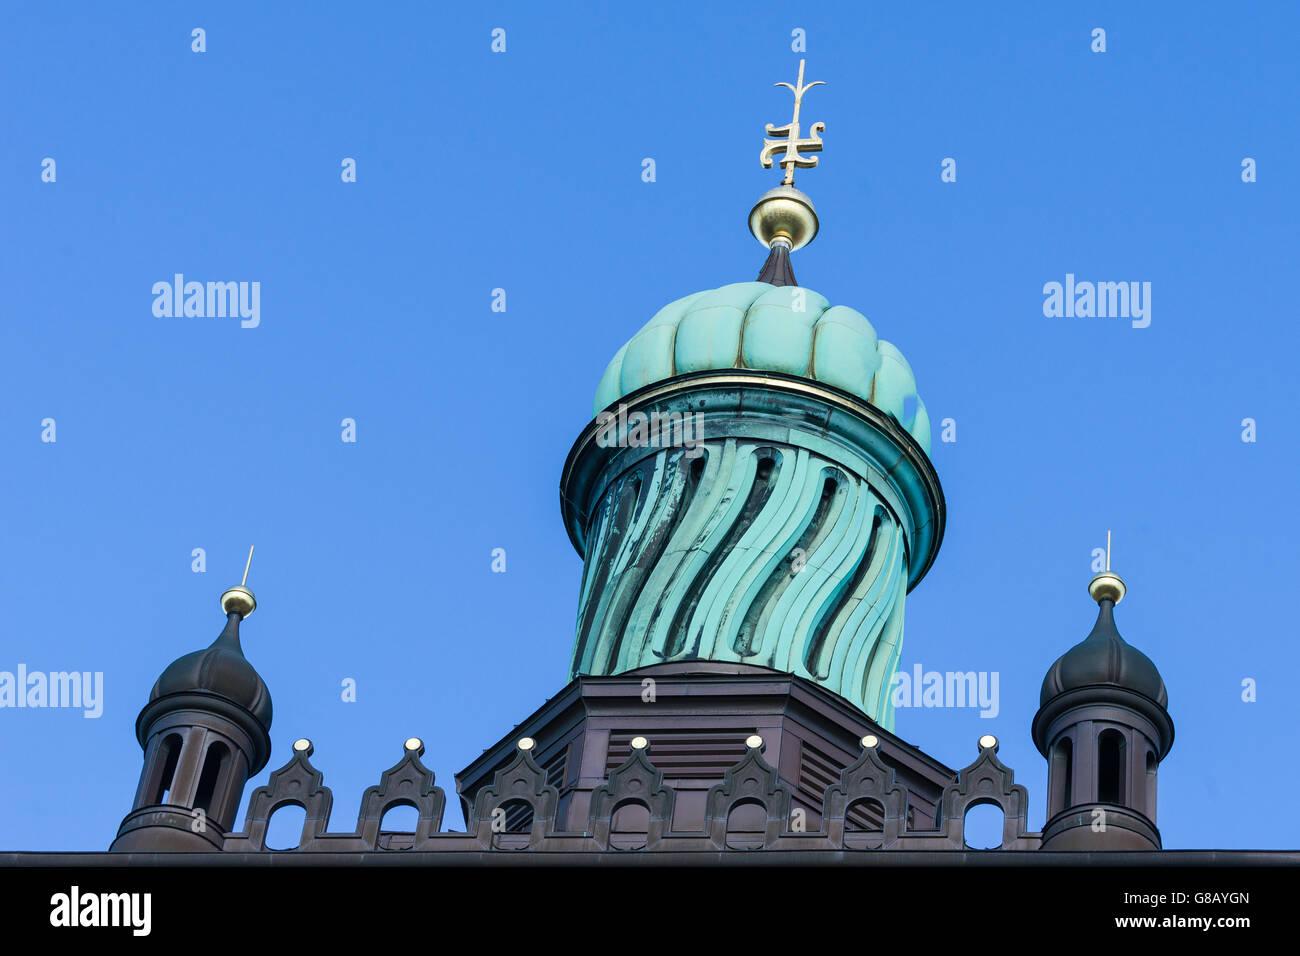 Carlsberg City in Copenhagen, Copper dome - Stock Image